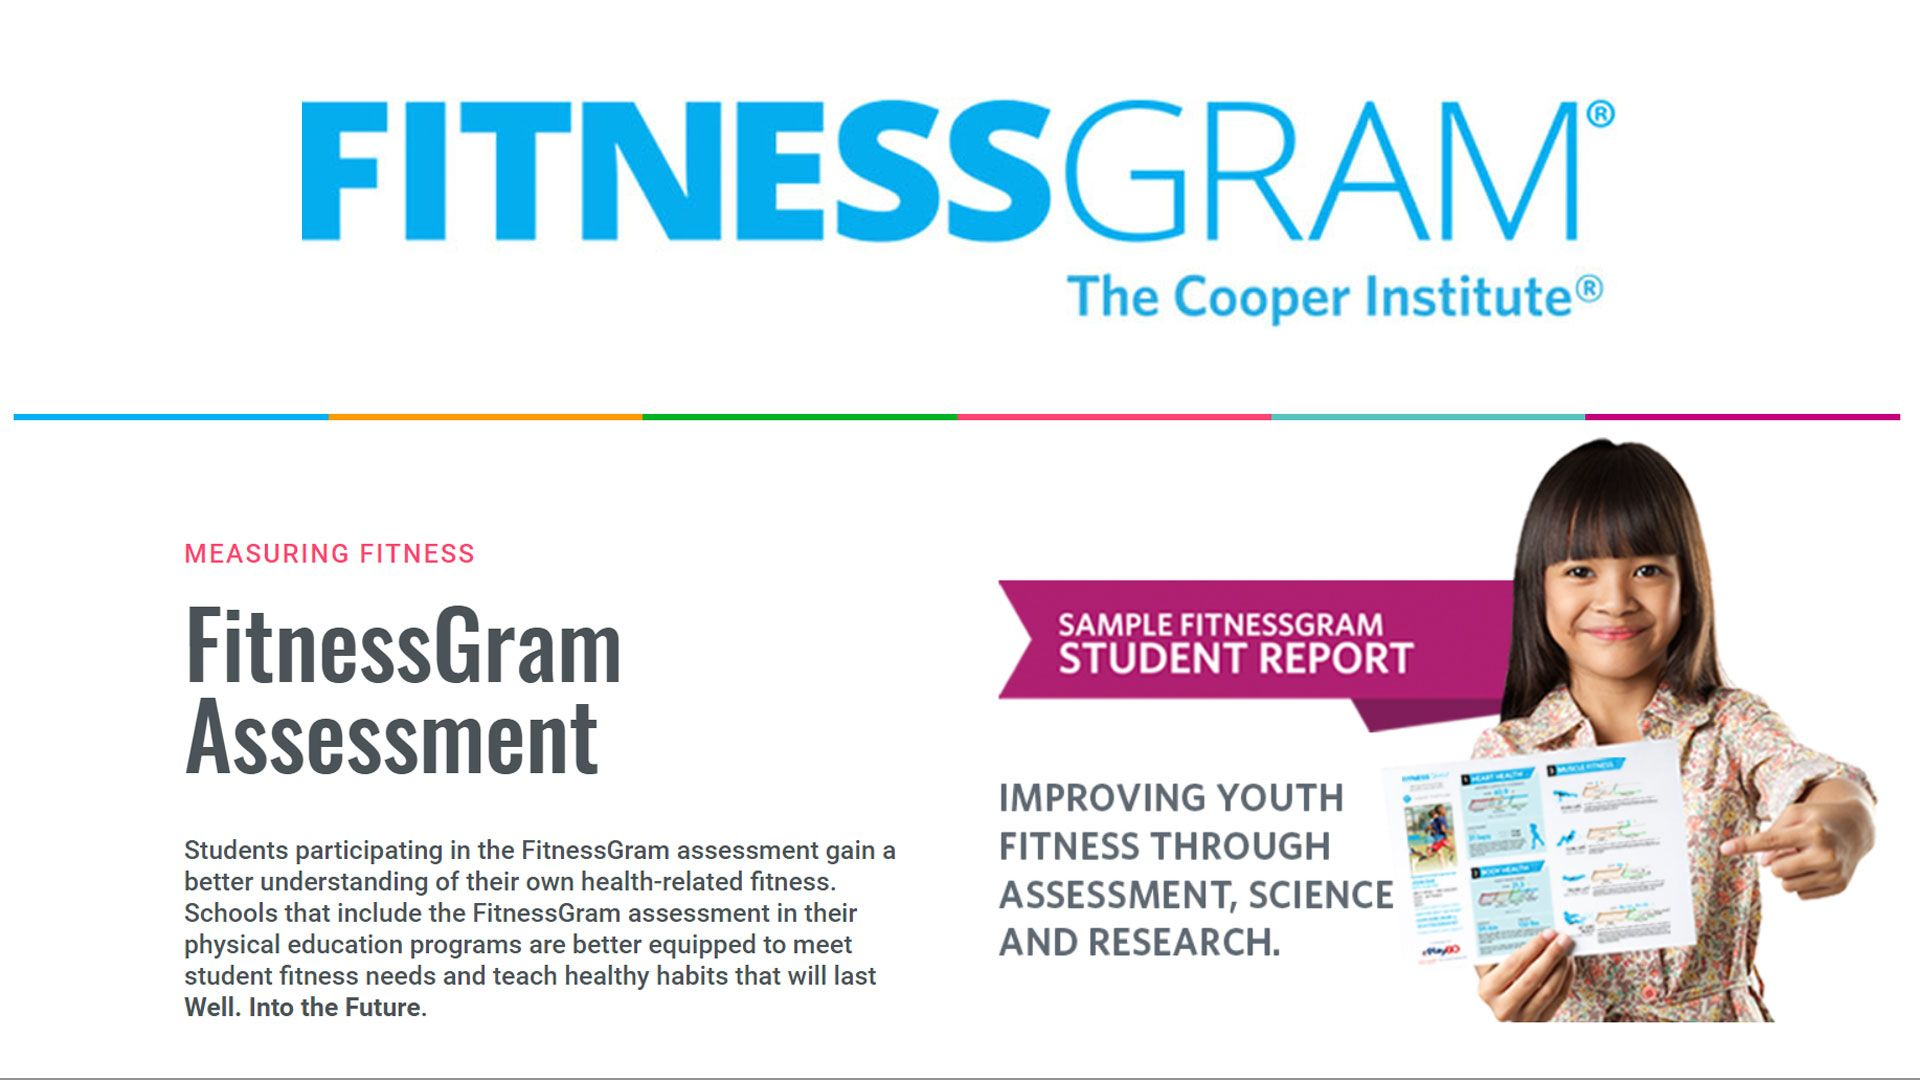 FitnessGram